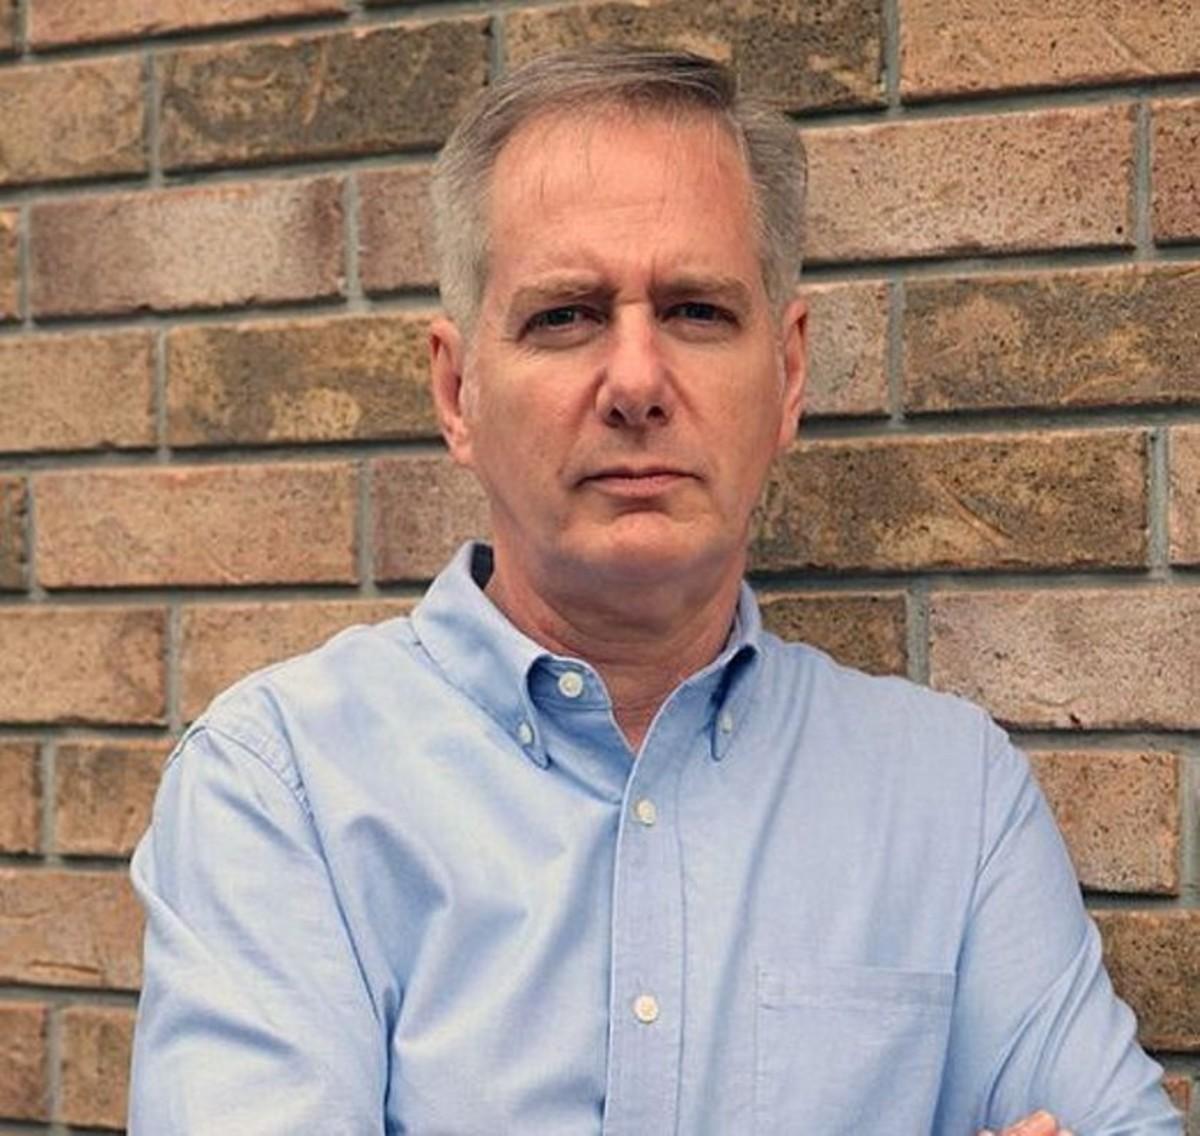 Kirkland Lake councilor and mayoral candidate Todd Morgan